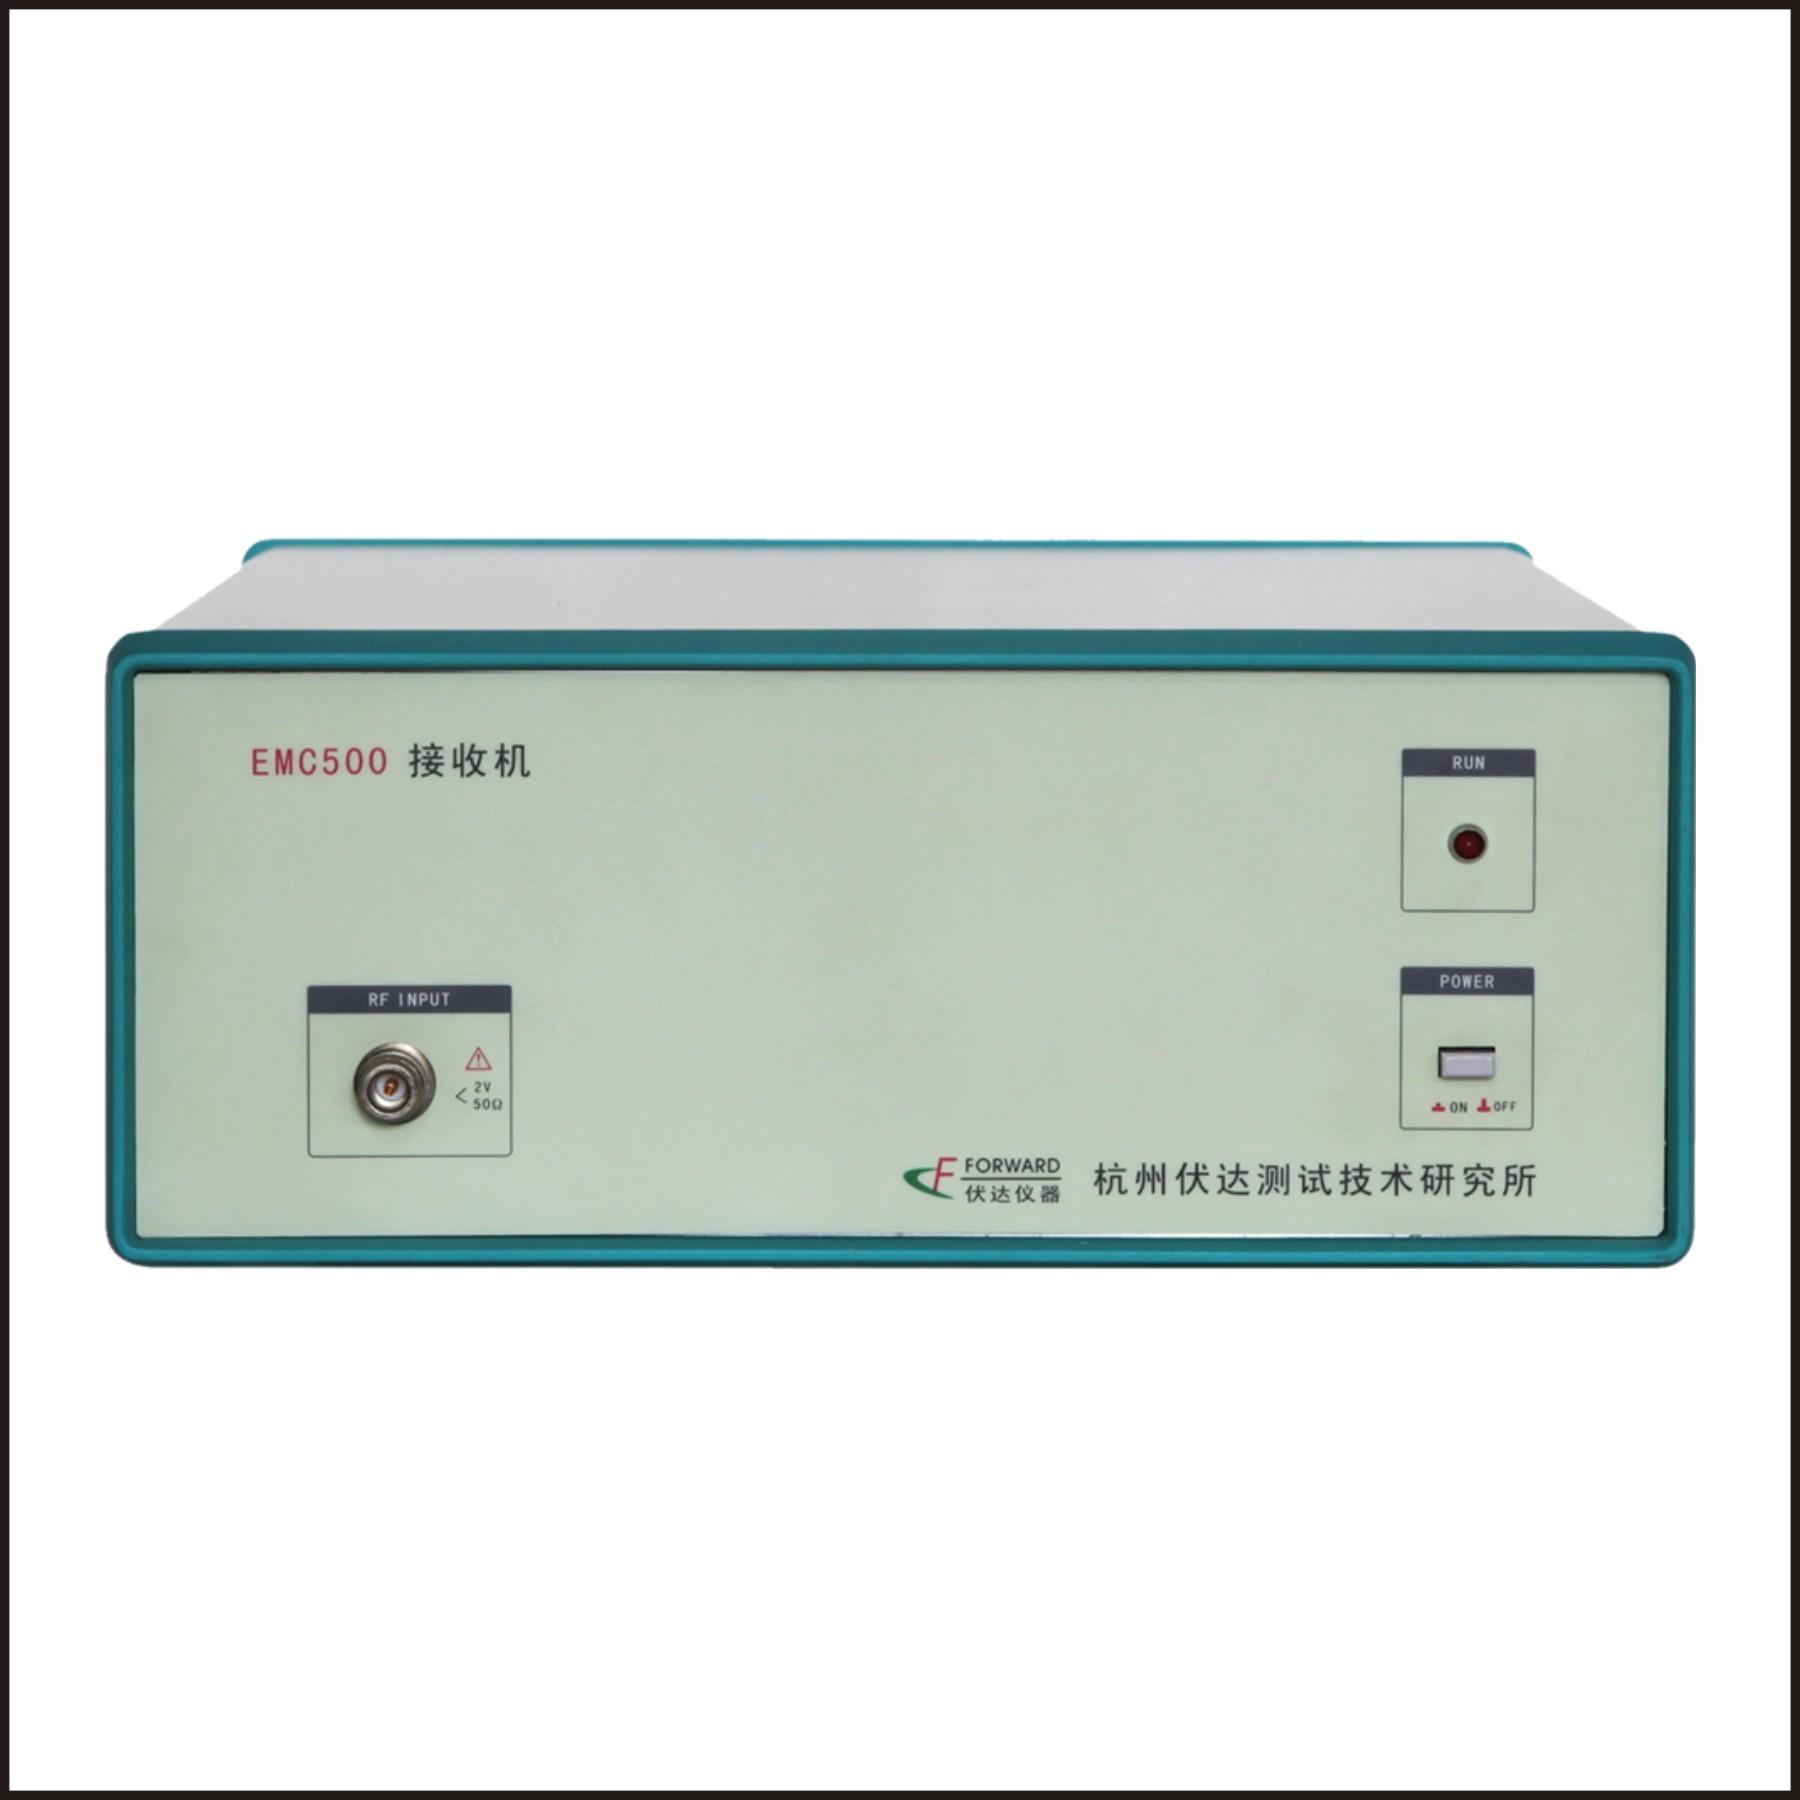 EMC500 电磁兼容•传导干扰测试系统